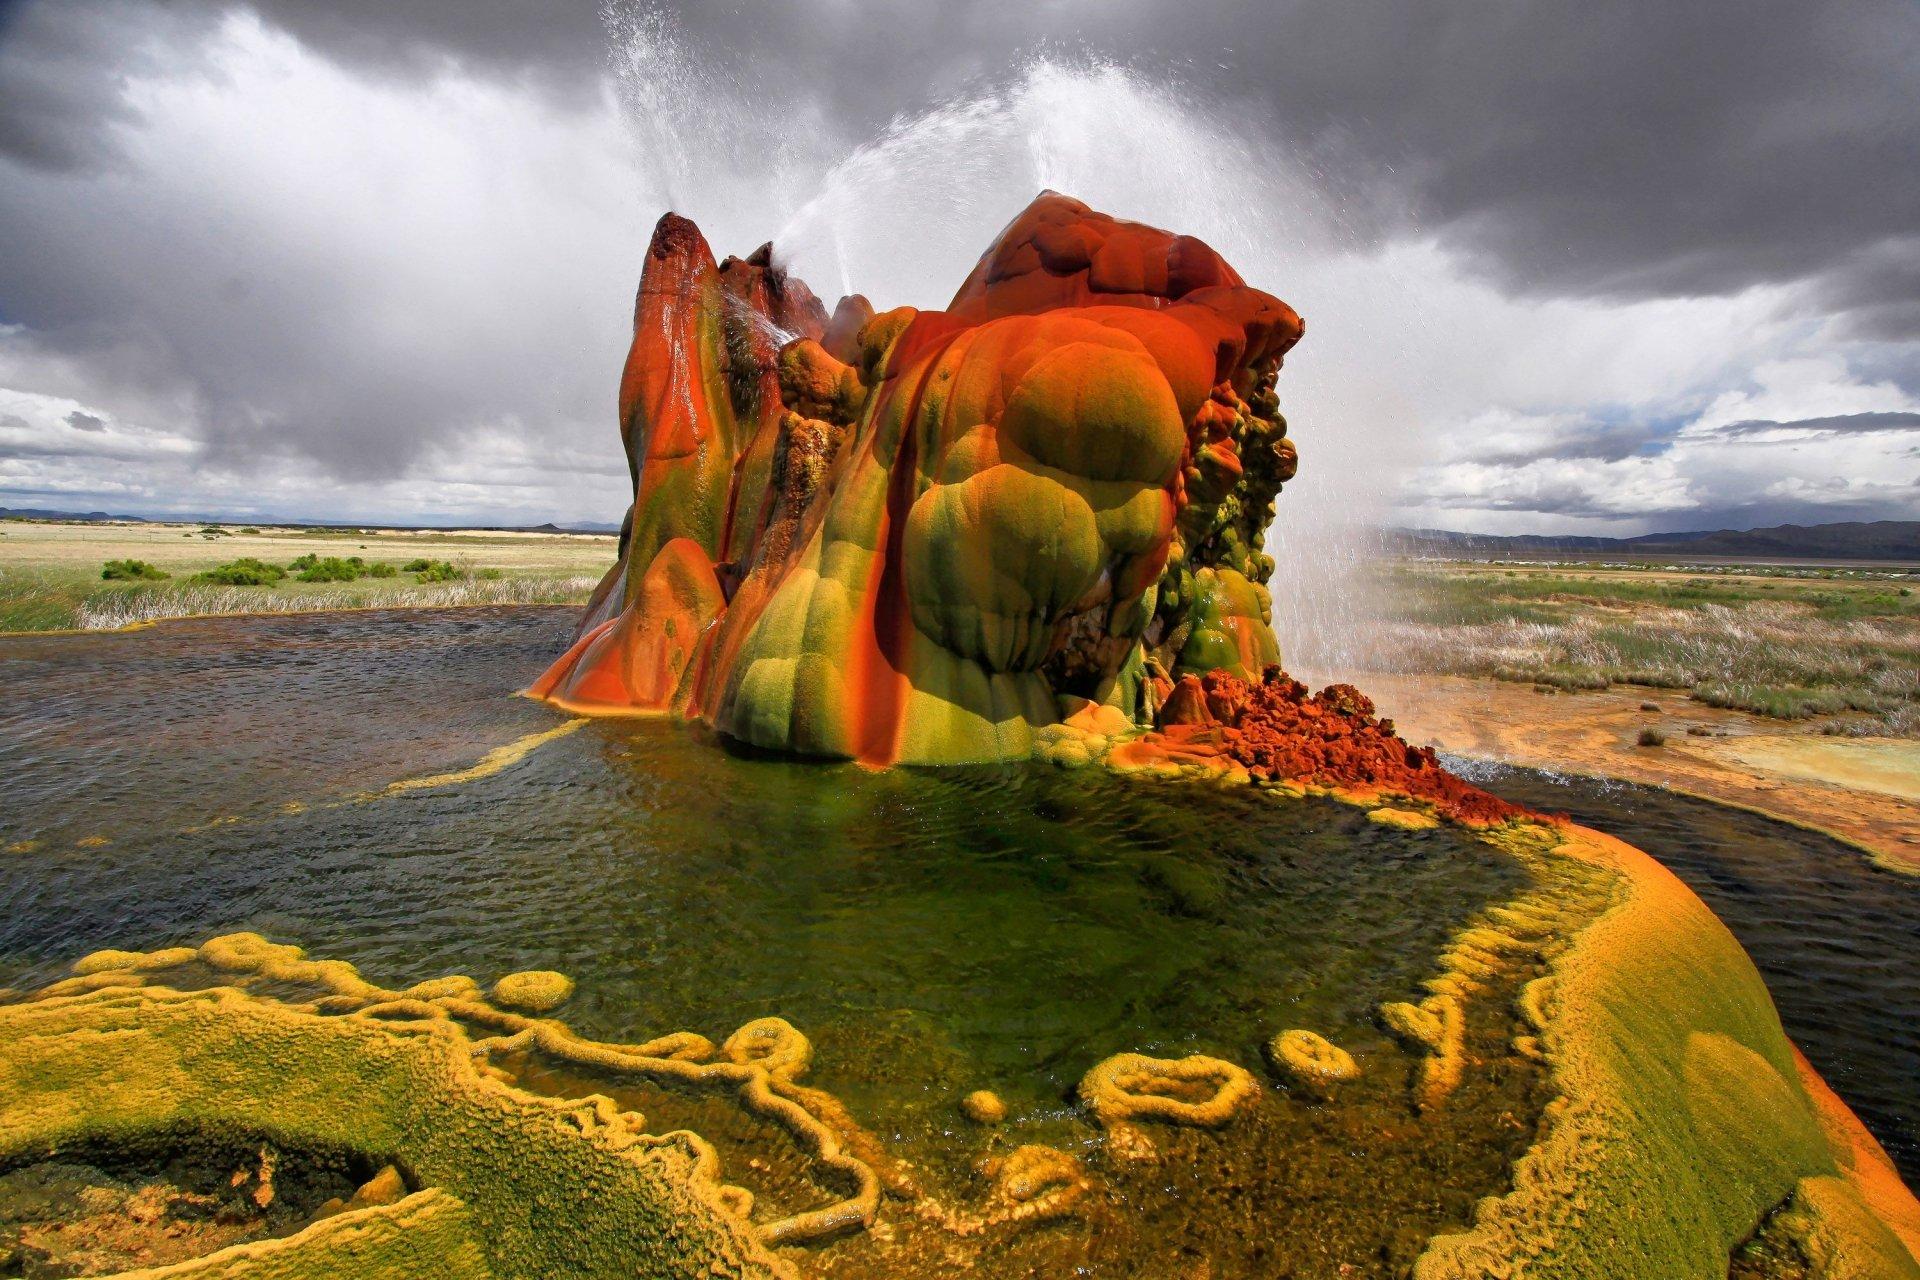 Fly geyser nevada hd wallpaper background image 3000x2000 id 679228 wallpaper abyss - Nevada wallpaper hd ...